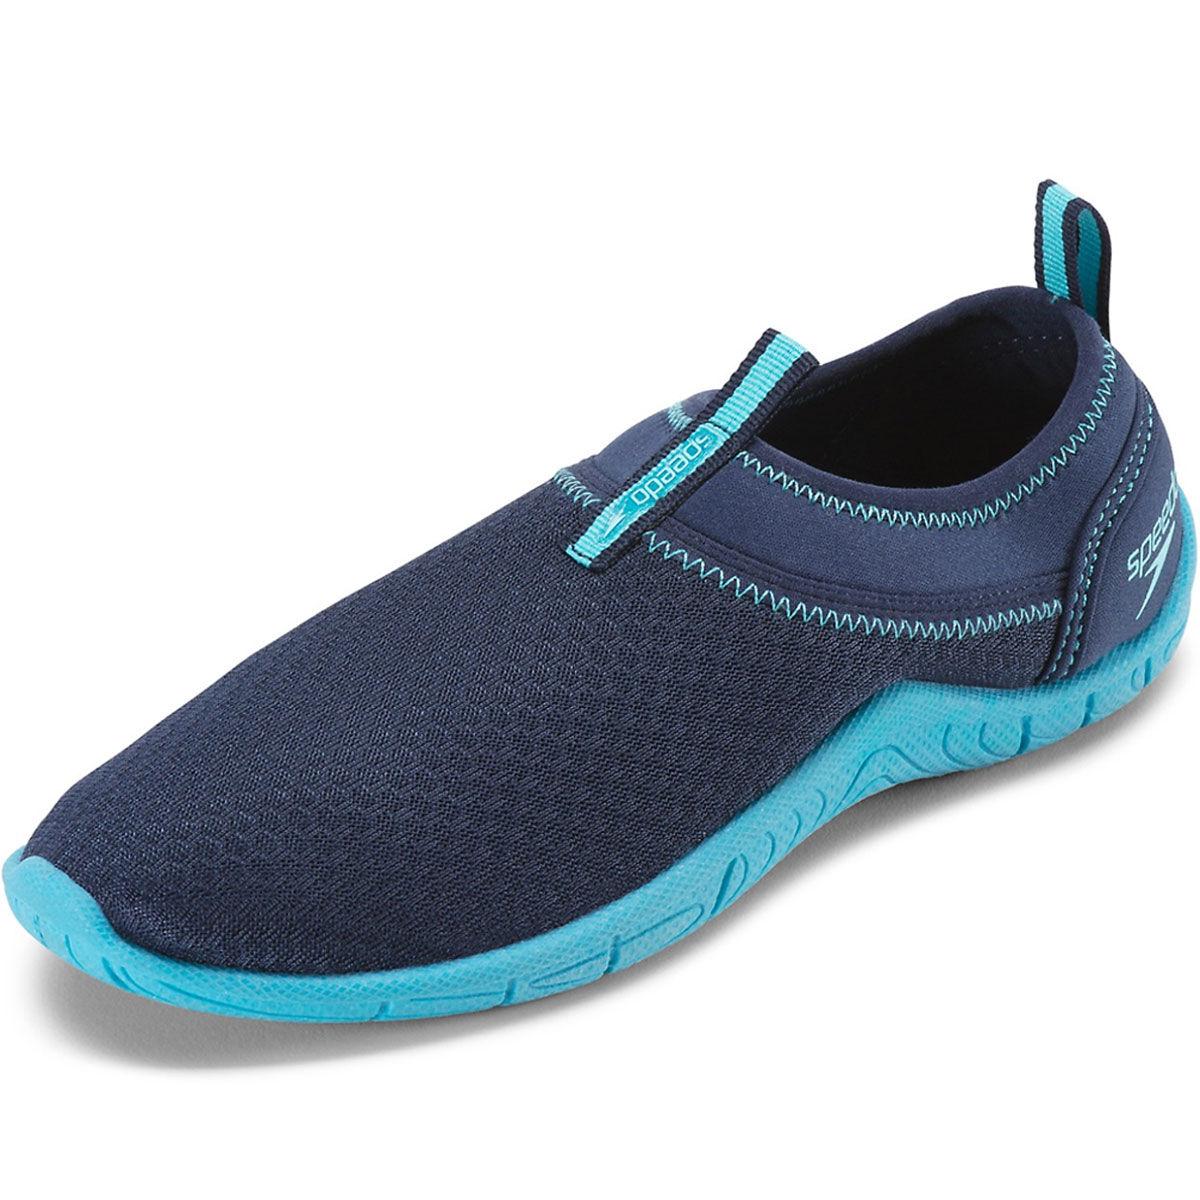 Speedo Women's Tidal Cruiser Water Shoes, Blue